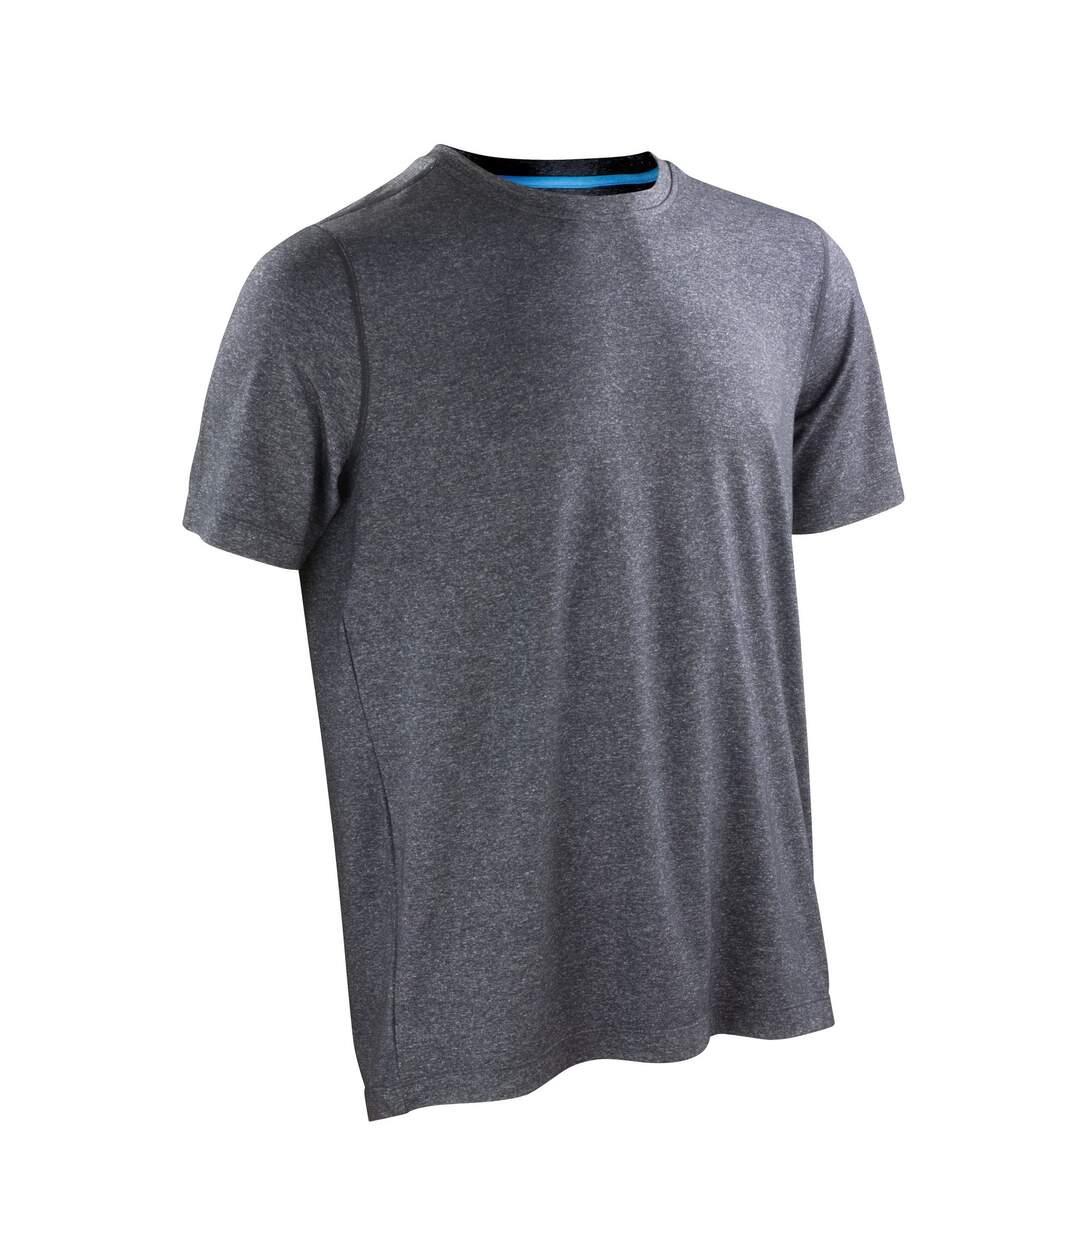 Spiro Mens Shiny Marl Short Sleeve Fitness T-Shirt (Phantom Grey / Ocean Blue) - UTRW4773